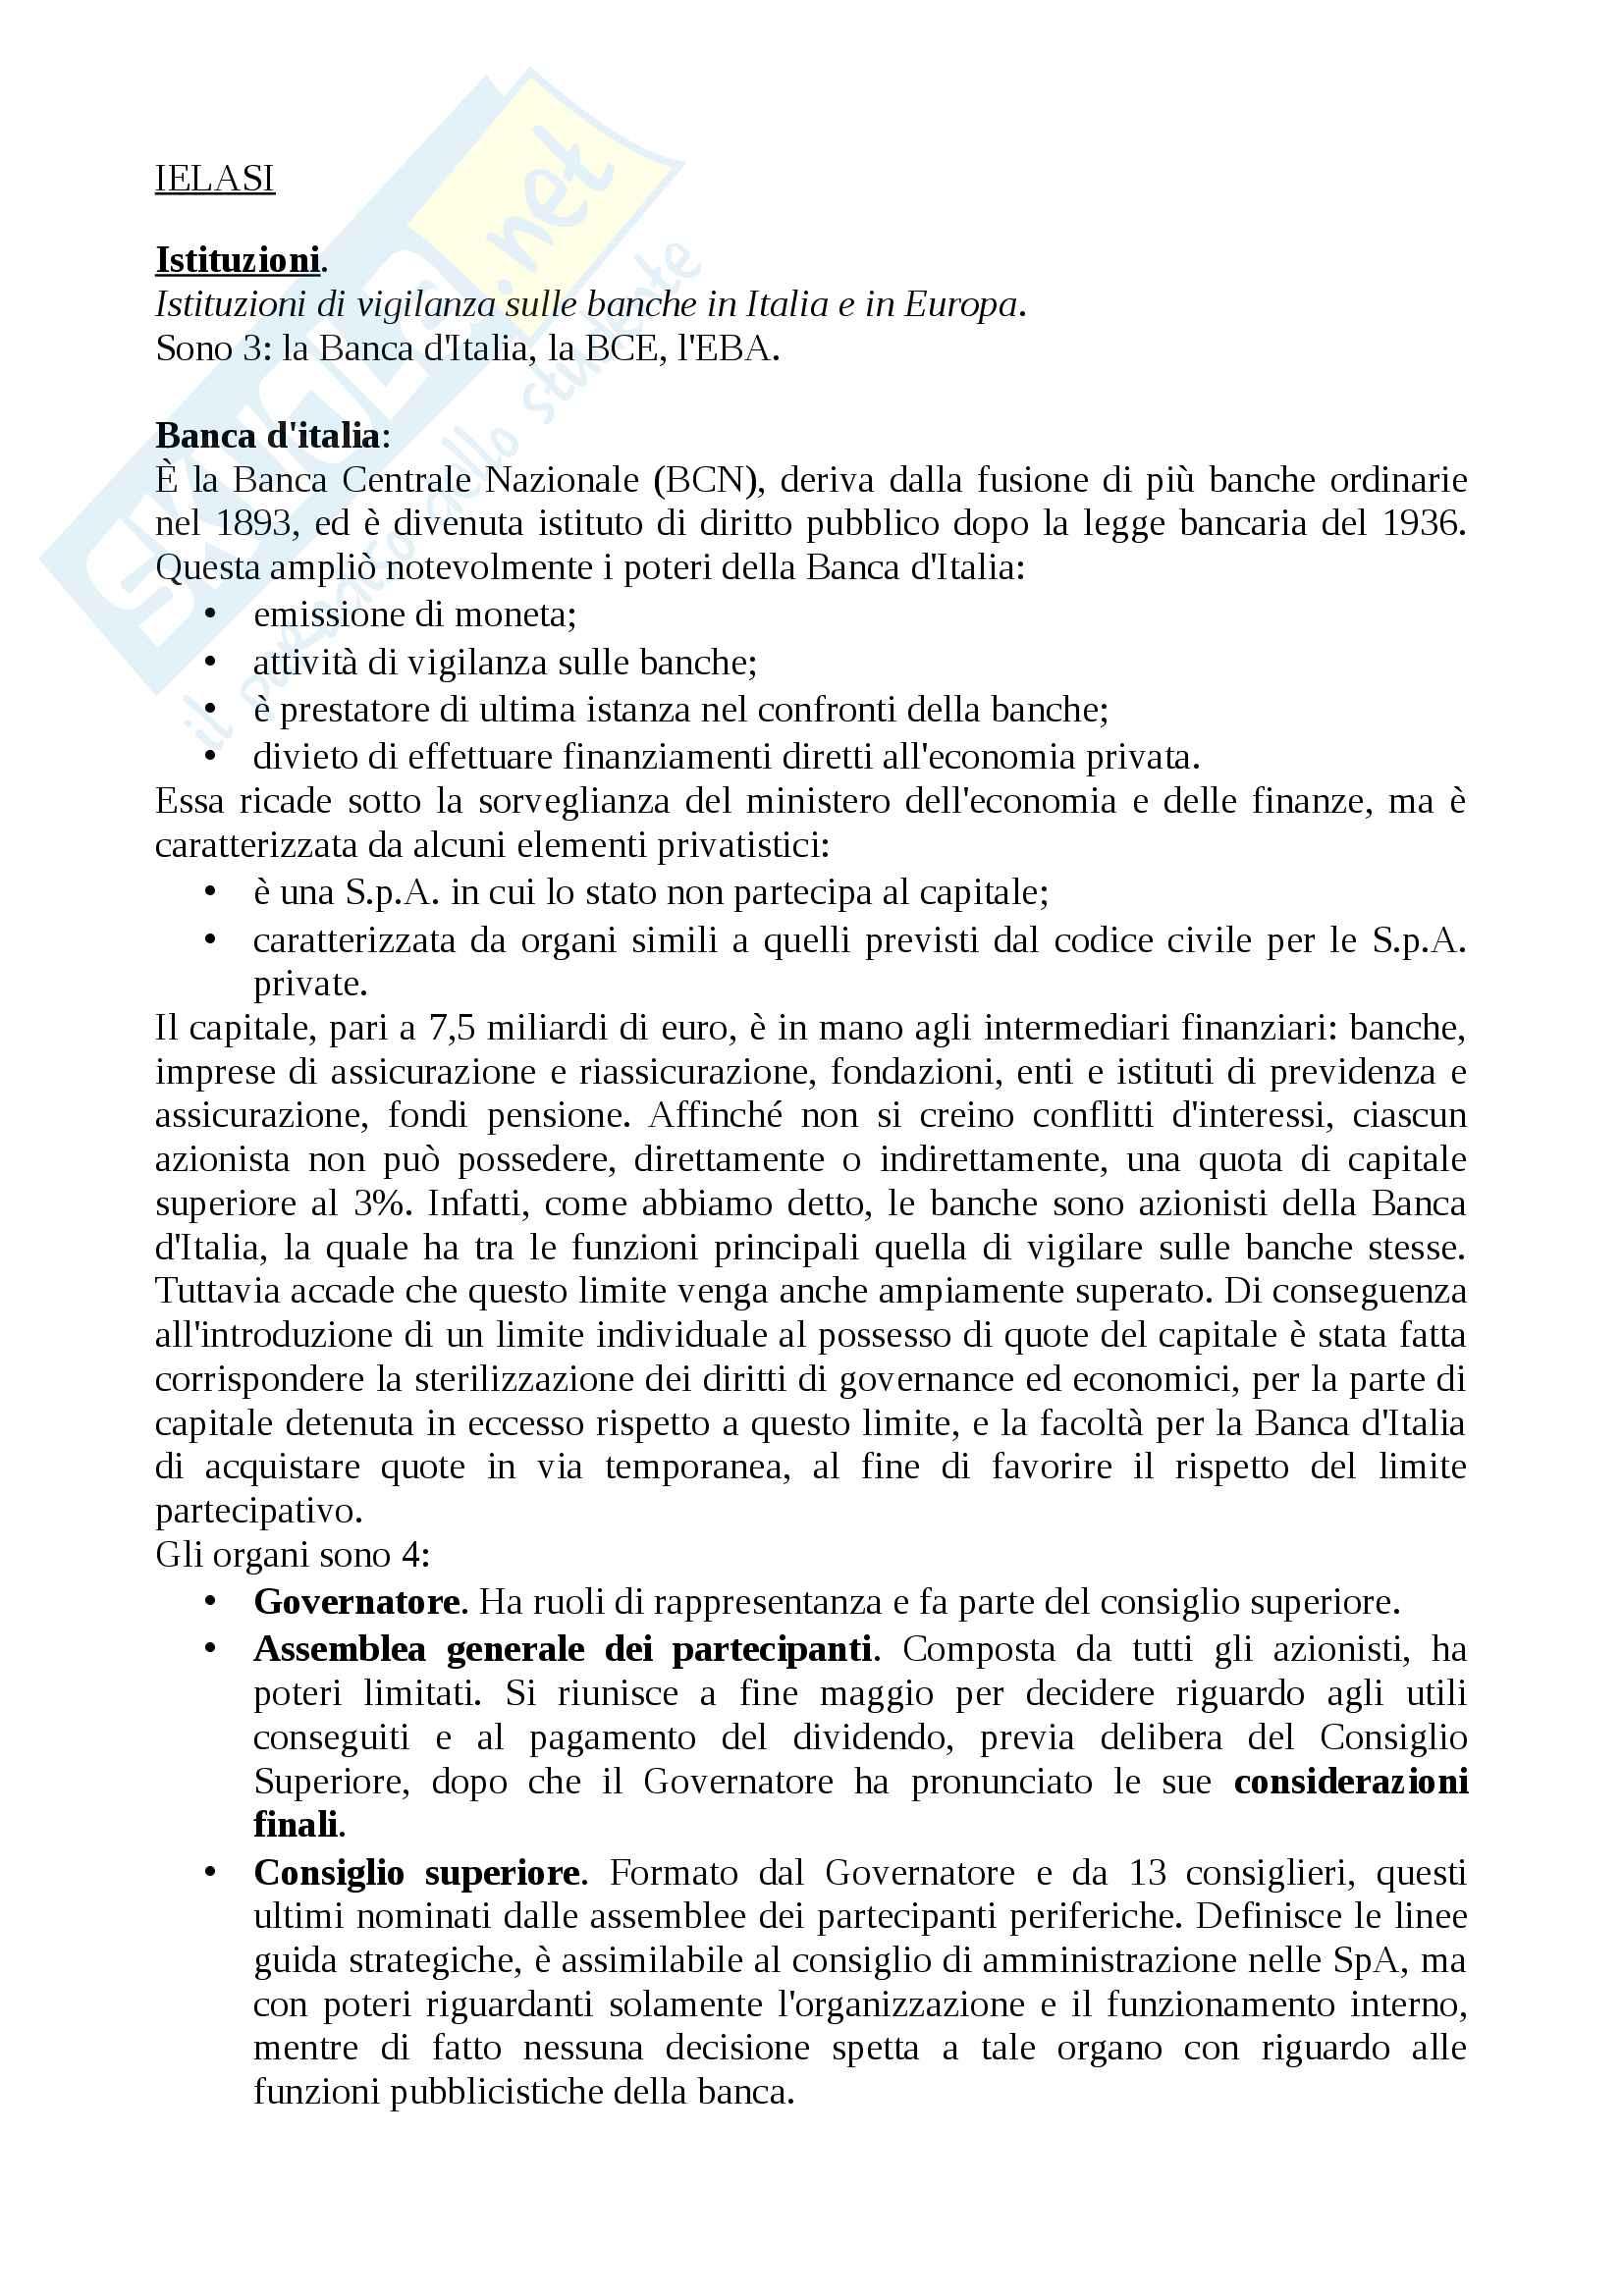 "Riassunto esame intermediari finanziari, prof.ssa Federica Ielasi (9 CFU), libro consigliato: ""lineamenti di gestione bancaria"", Lorenzo Gai."